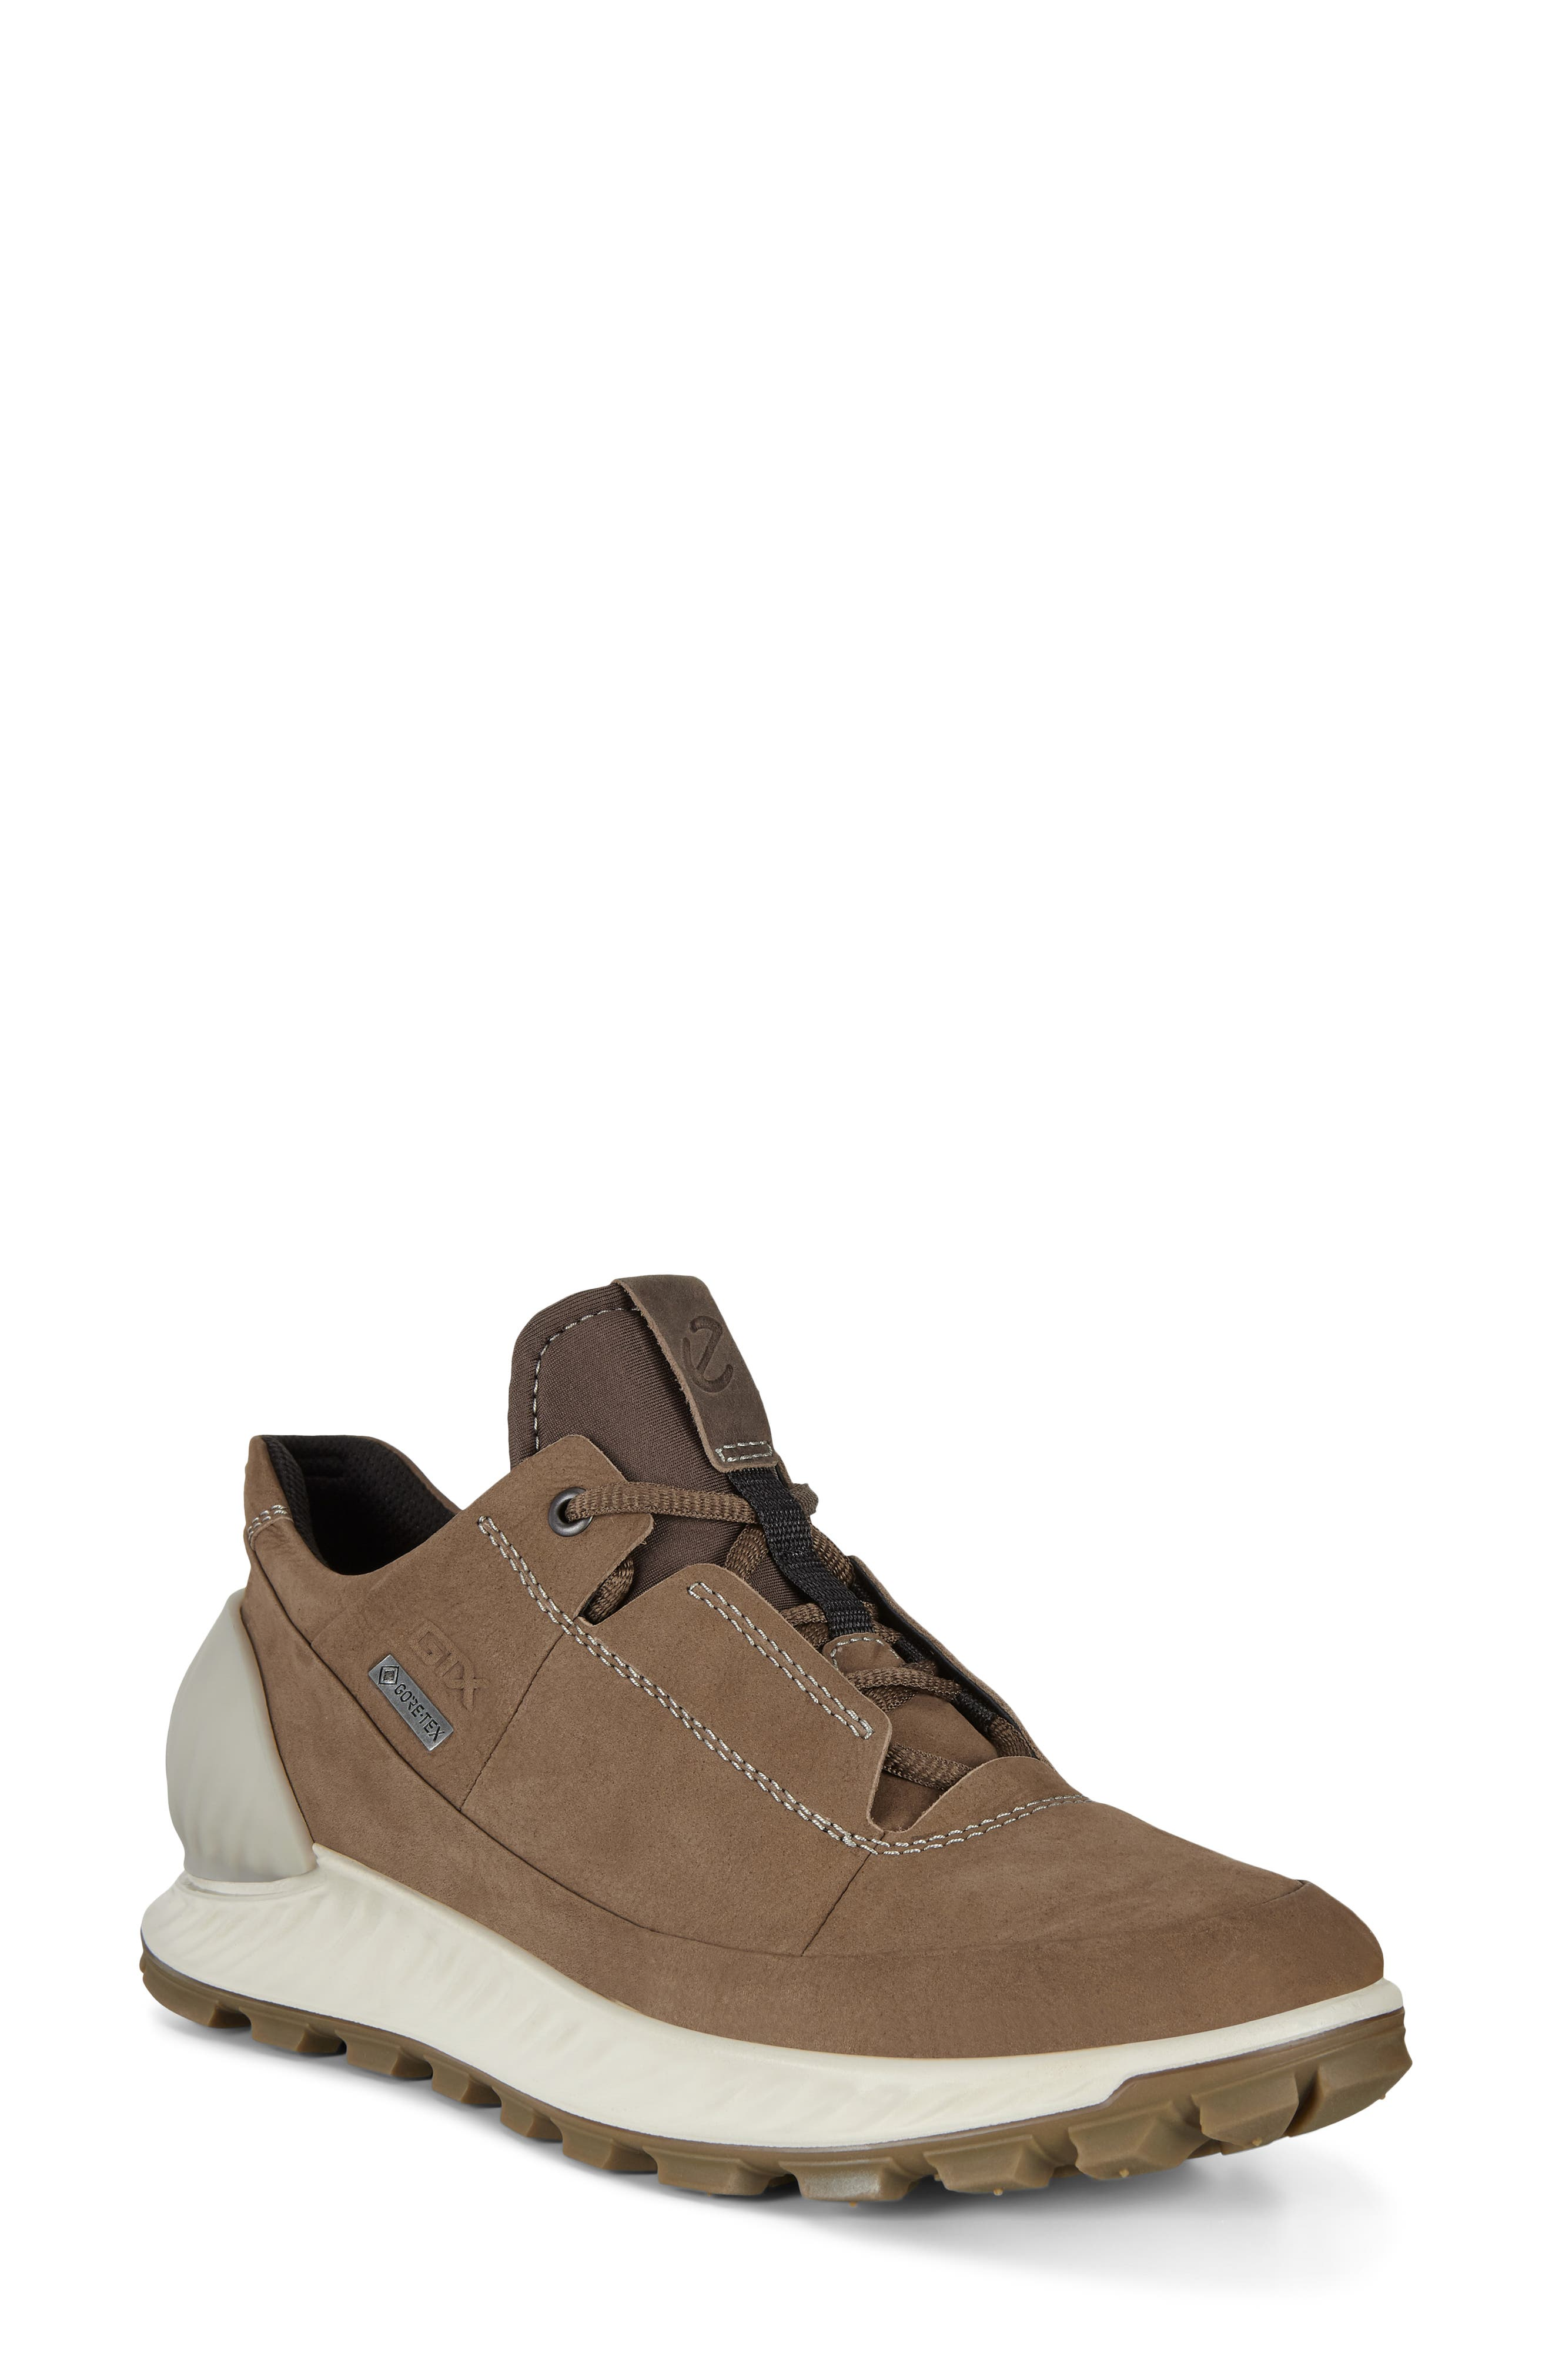 Image of ECCO Exostrike High Top Sneaker